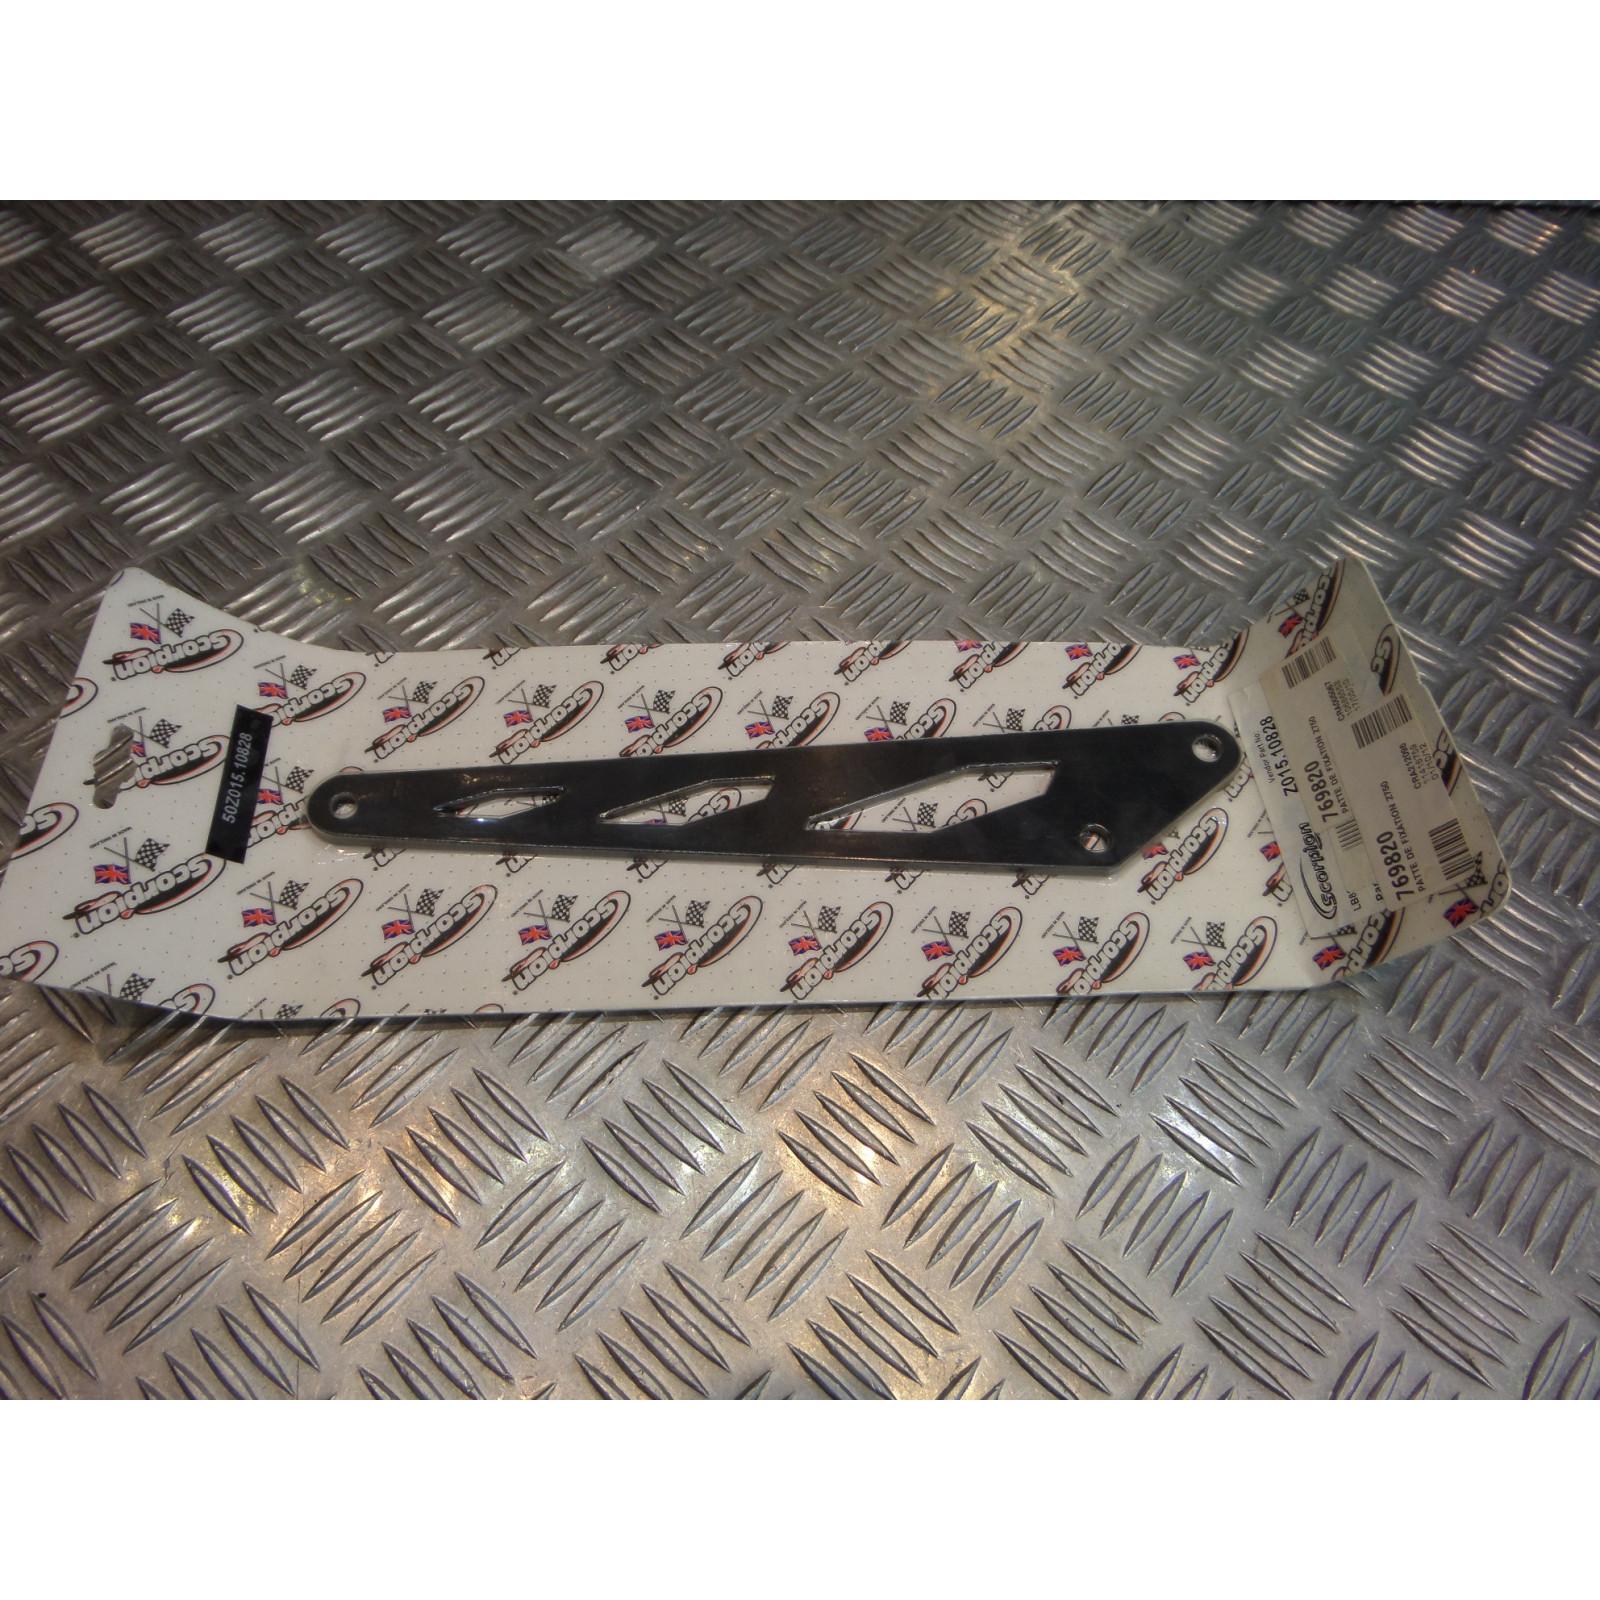 patte fixation pot silencieux echappement scorpion moto kawasaki z 750 769820 lb828 nouvelle generation z015.10828